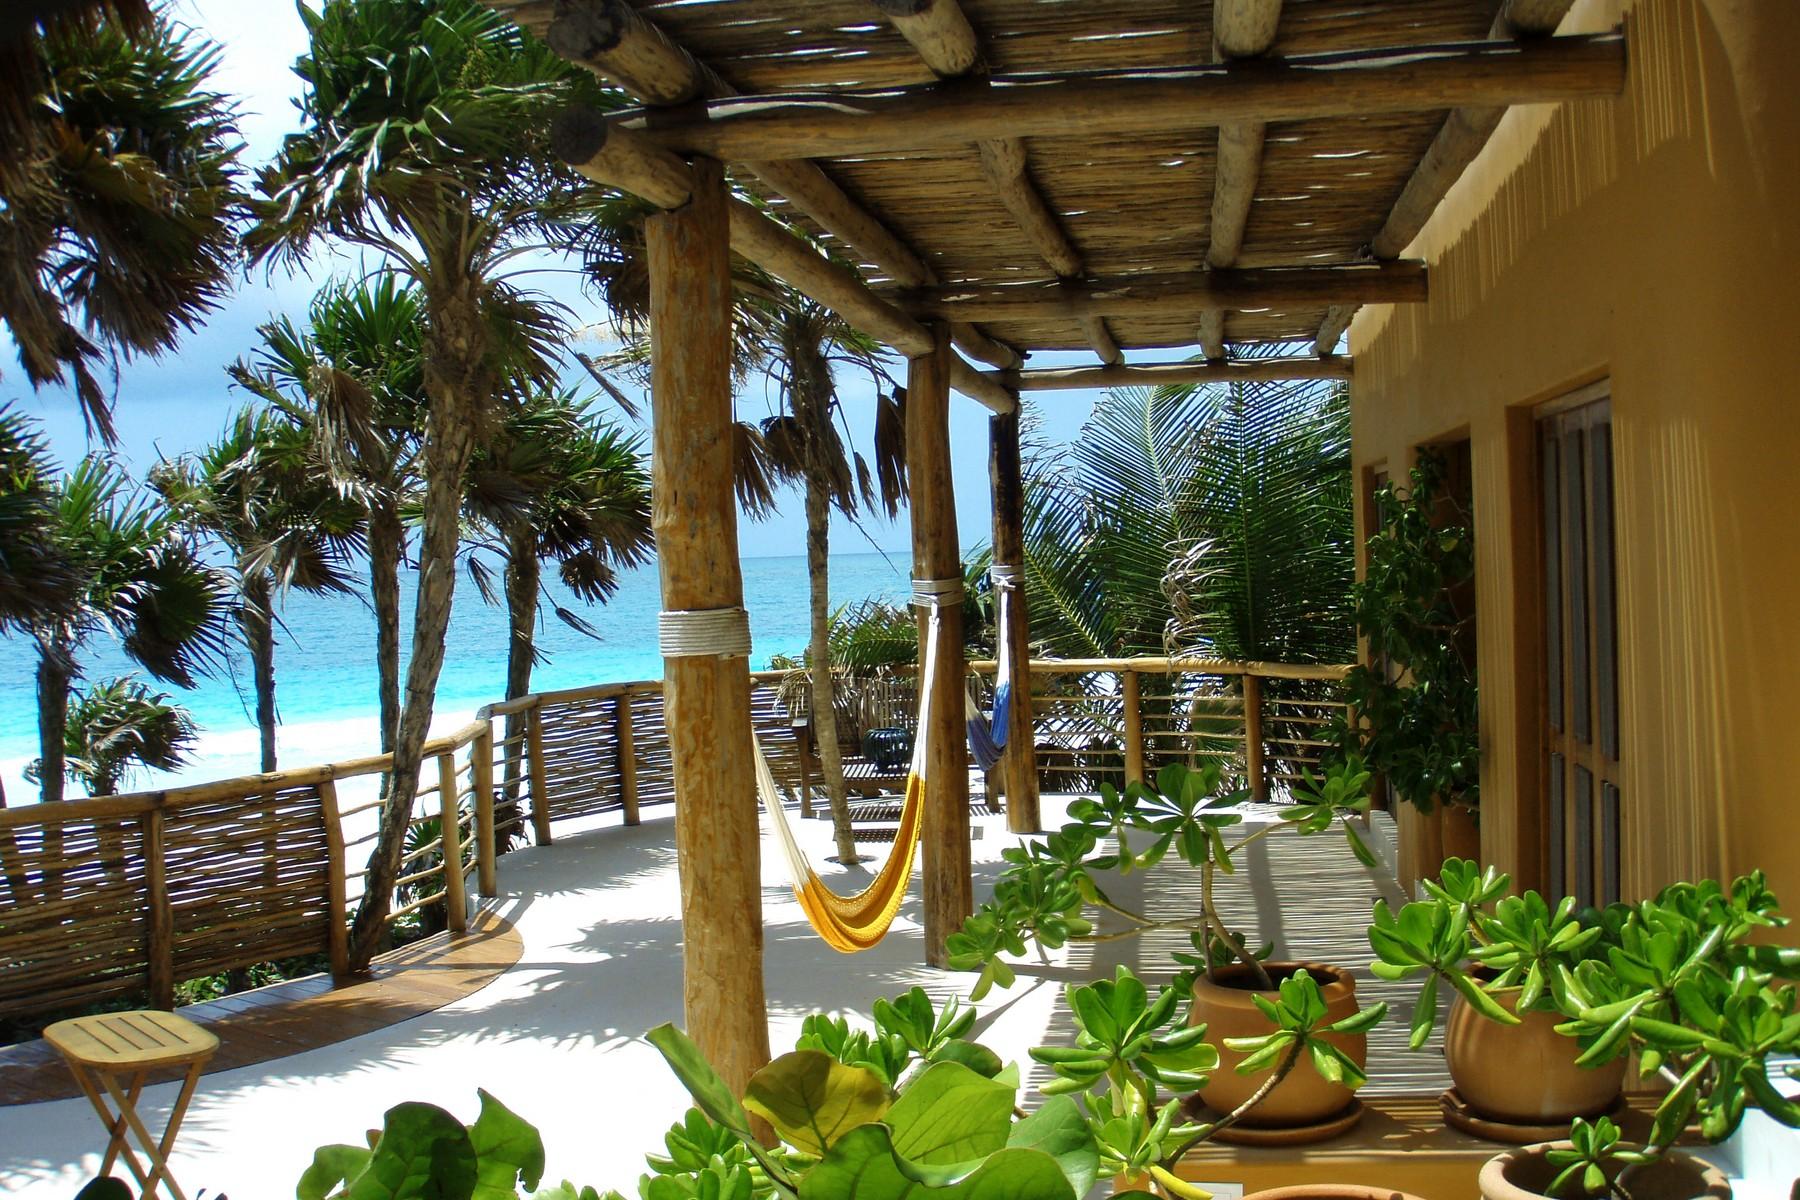 Additional photo for property listing at CASA SIANKAANA Camino Tulum-Boca Paila Lote Fracc. 1 Tulum, Quintana Roo 77780 México